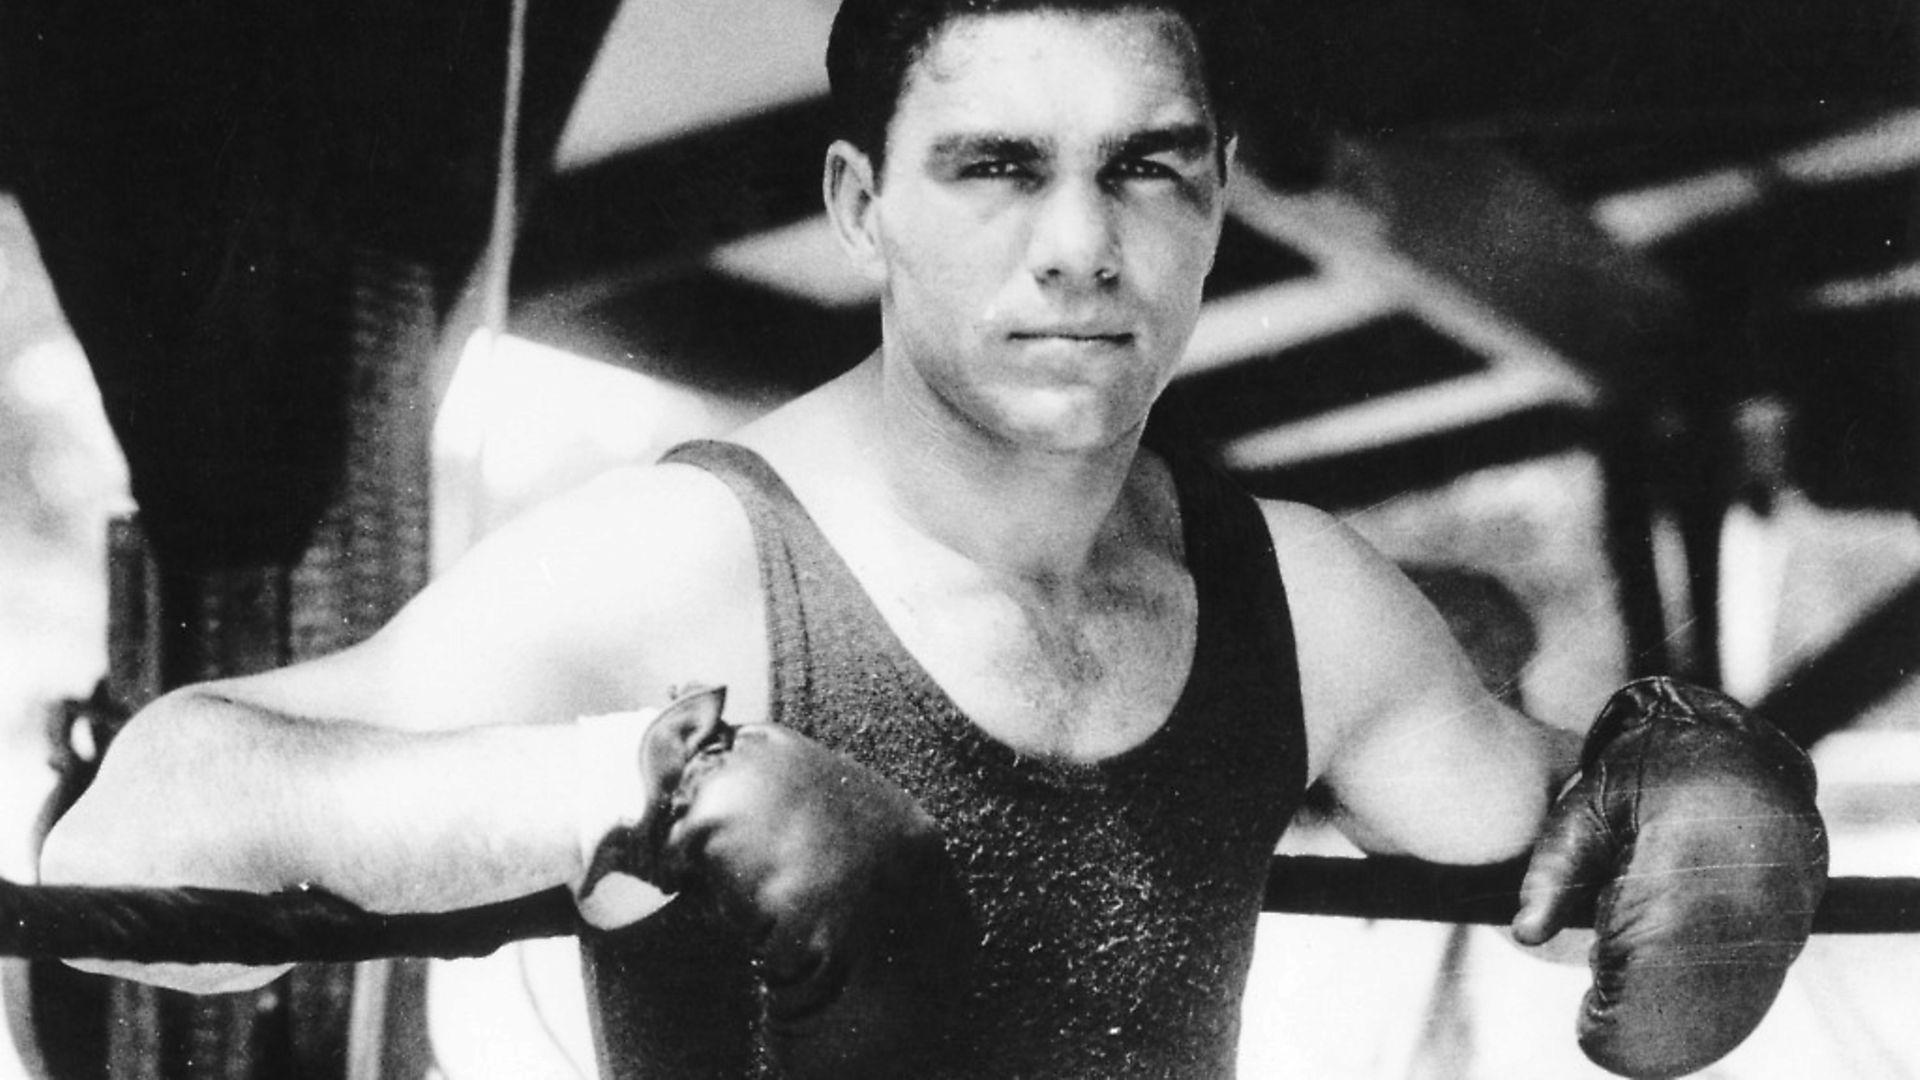 German heavyweight boxing champion Max Schmeling. Photo: Max Machon/ullstein bild via Getty Images - Credit: ullstein bild via Getty Images